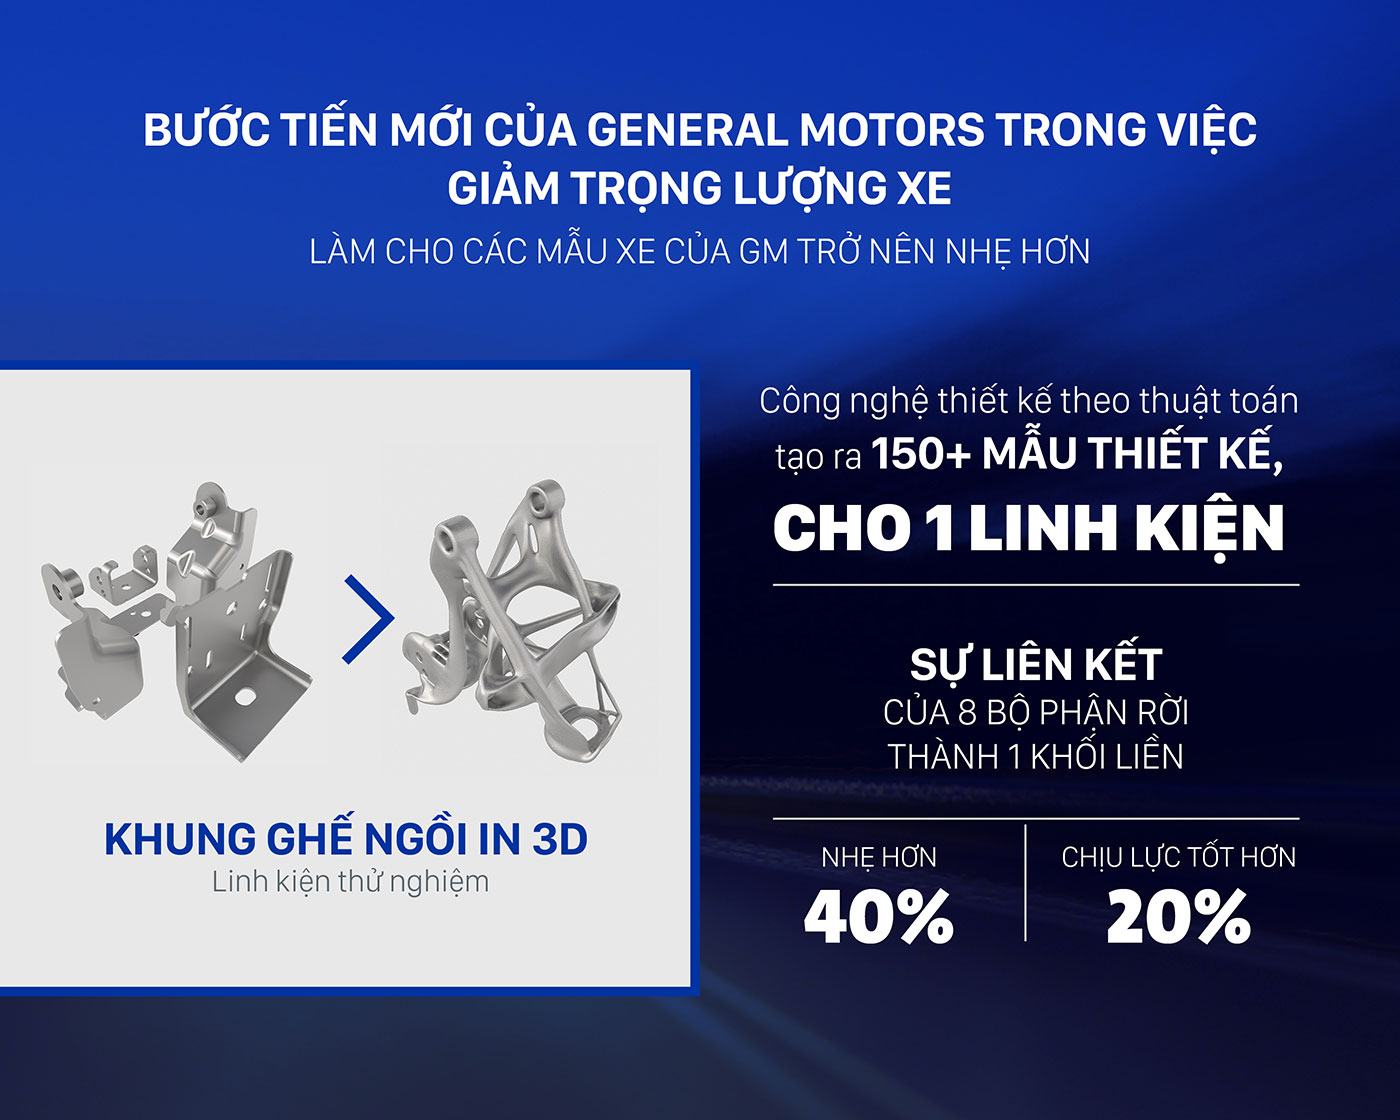 gm-infographic-innovation-vn-1.jpg